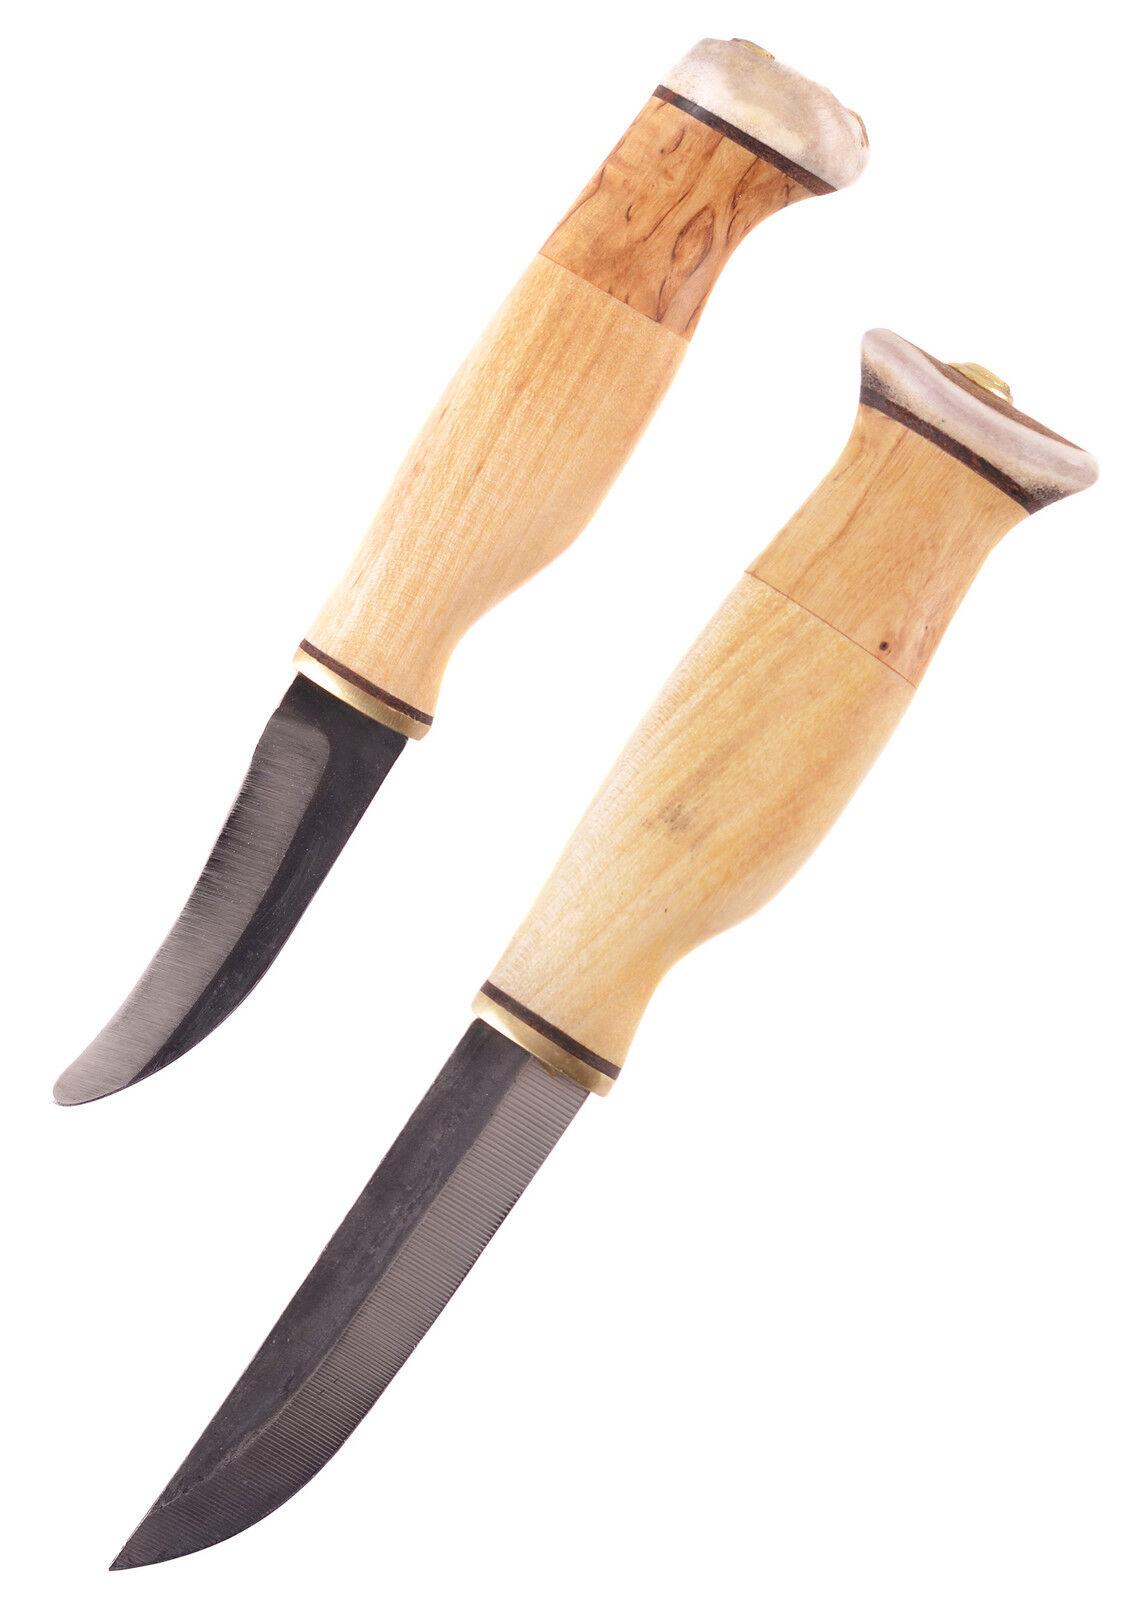 Doppelmesser mit Skinner, Wood-Jewel - Finnenmesser Sami Messer Jagdmesser